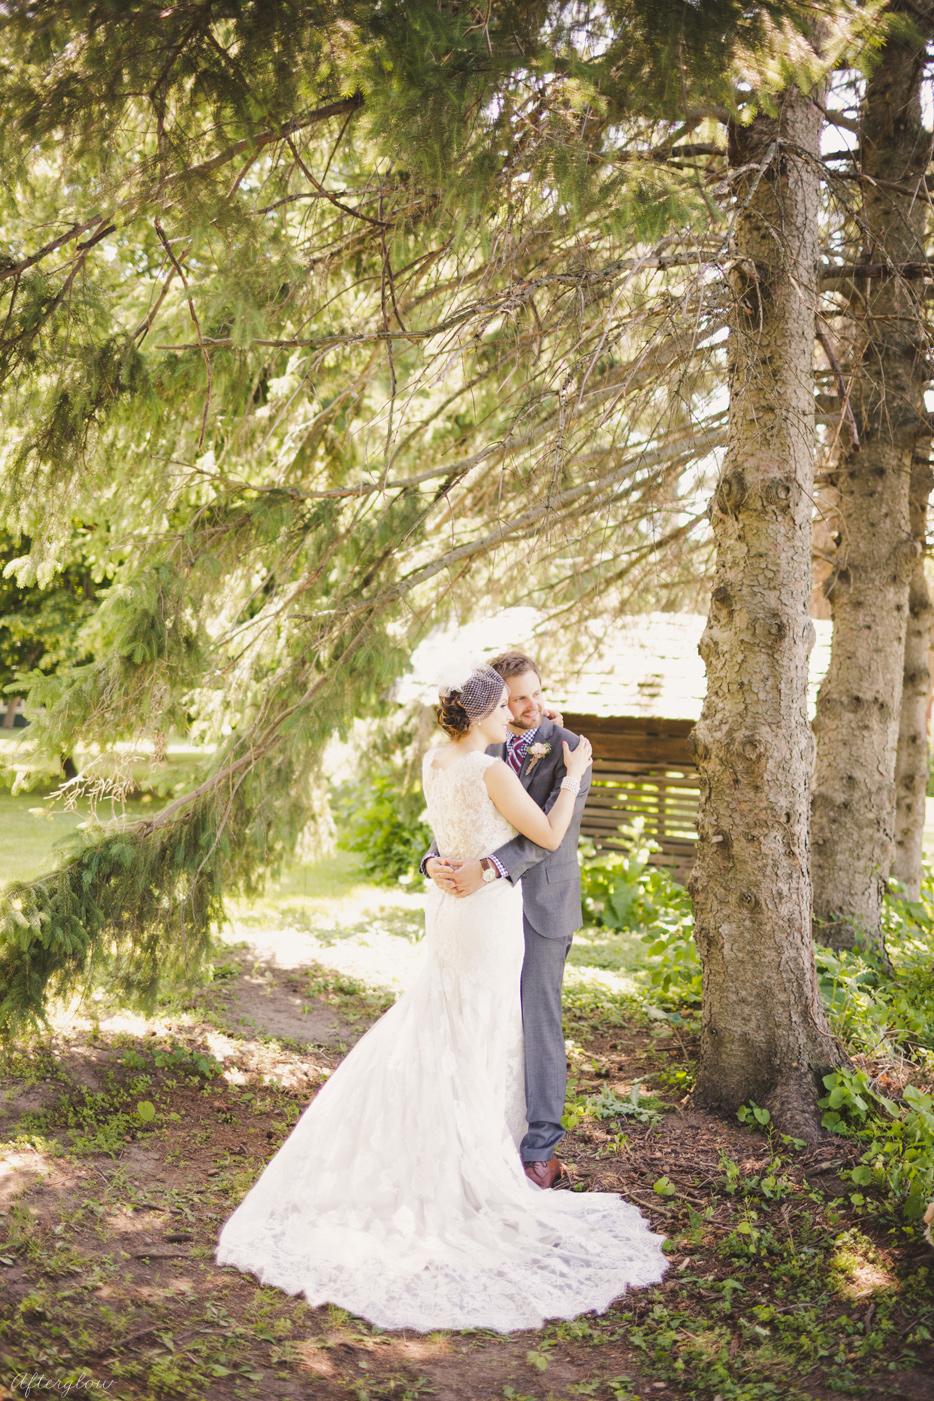 Afterglow_ShelbyAdam_Ravine_Vineyard_Wedding_Photography_Niagara025.jpg